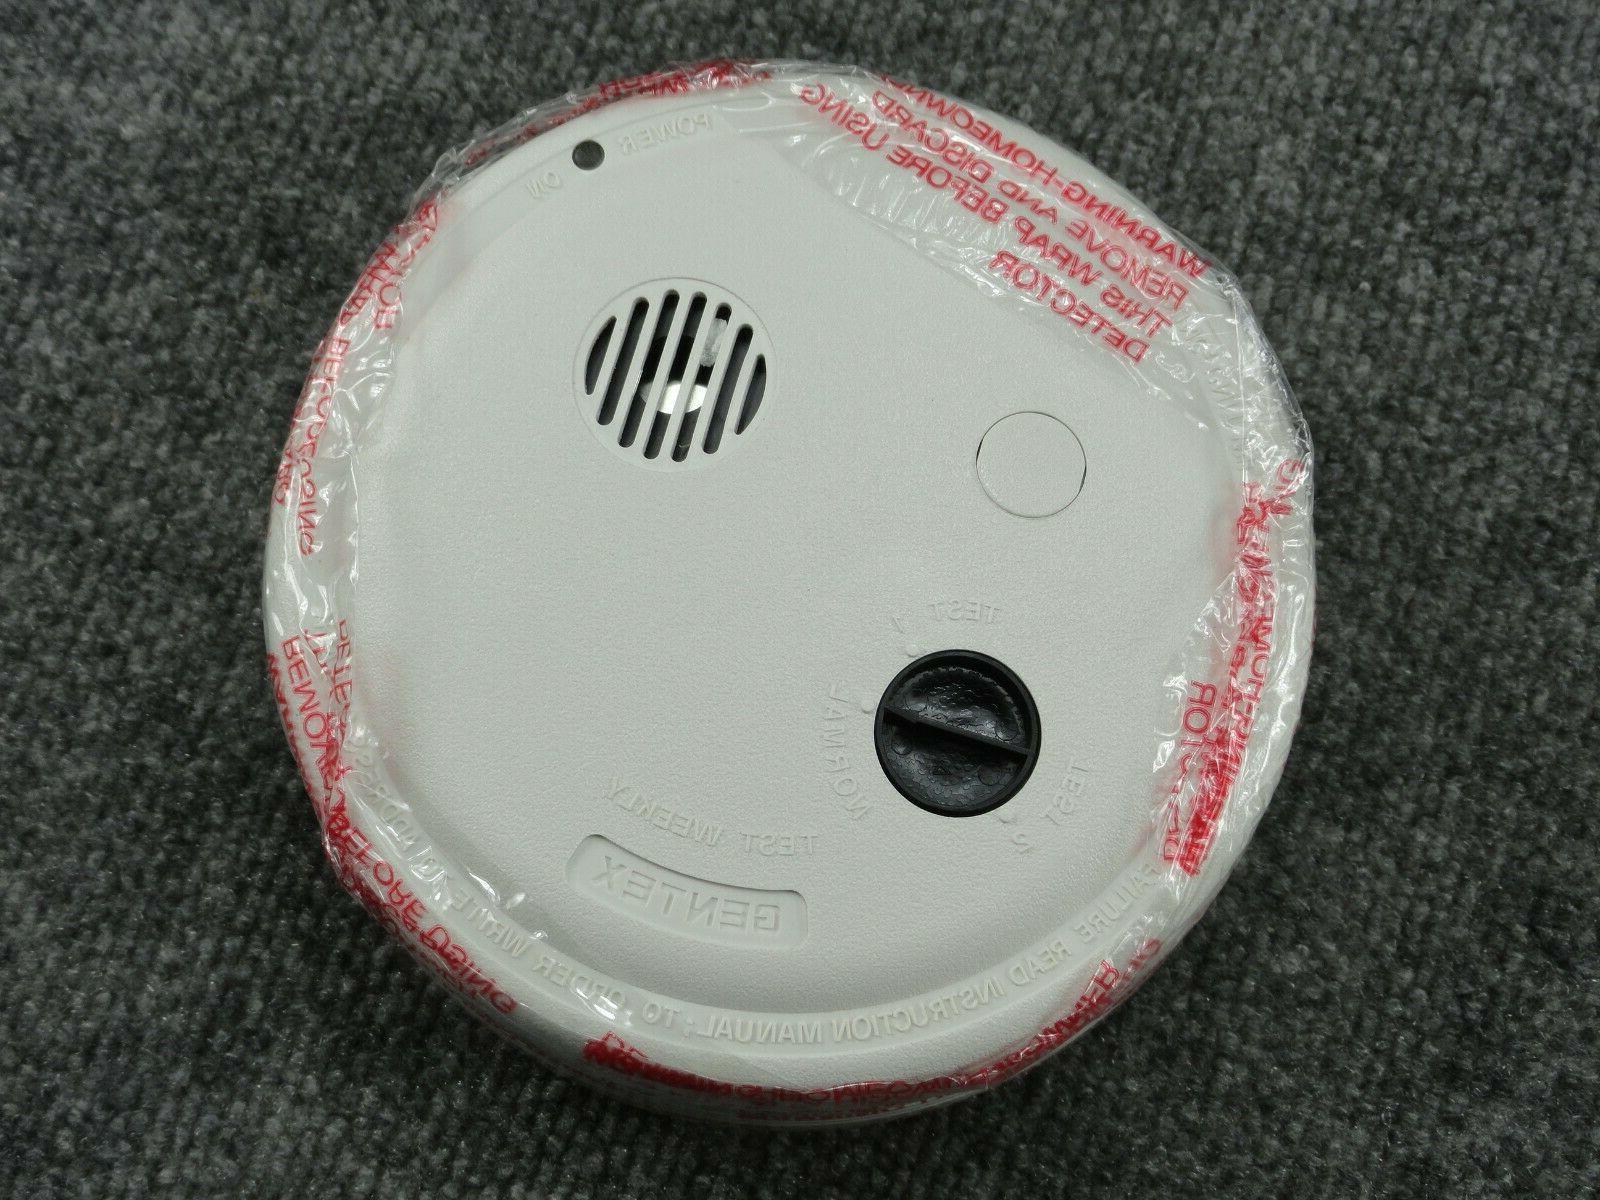 New Smoke Detector w/ Model 7100F